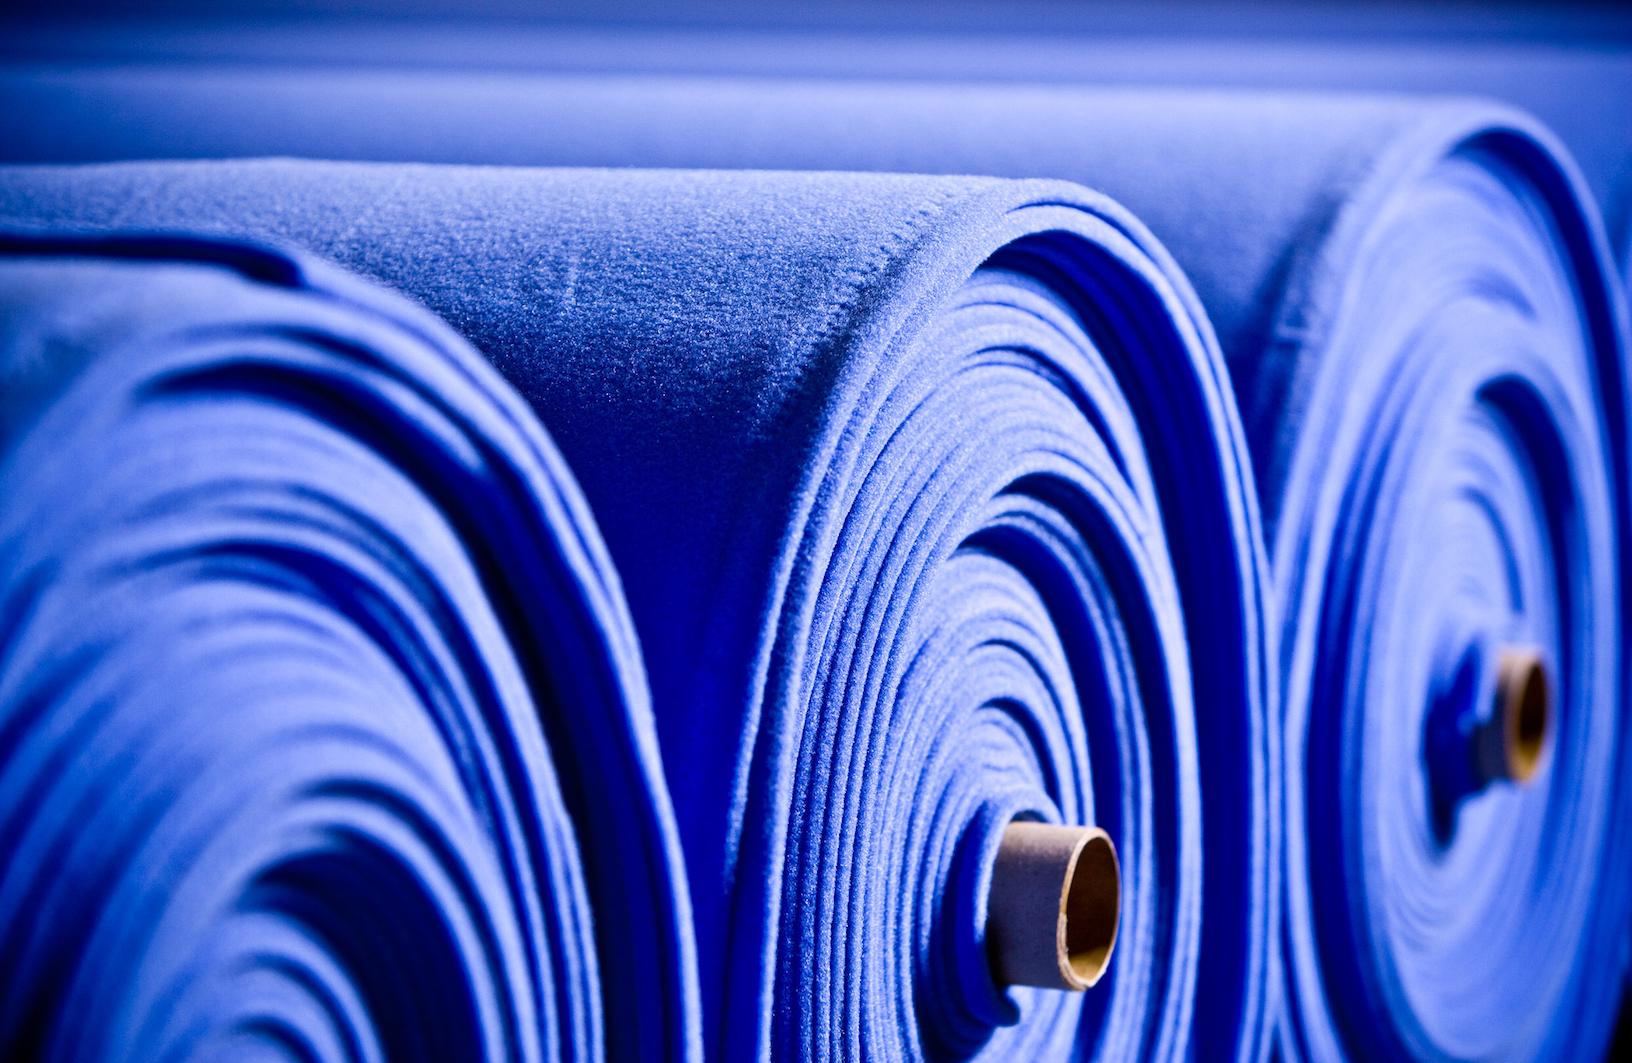 Polartec's 2020 Eco Textiles